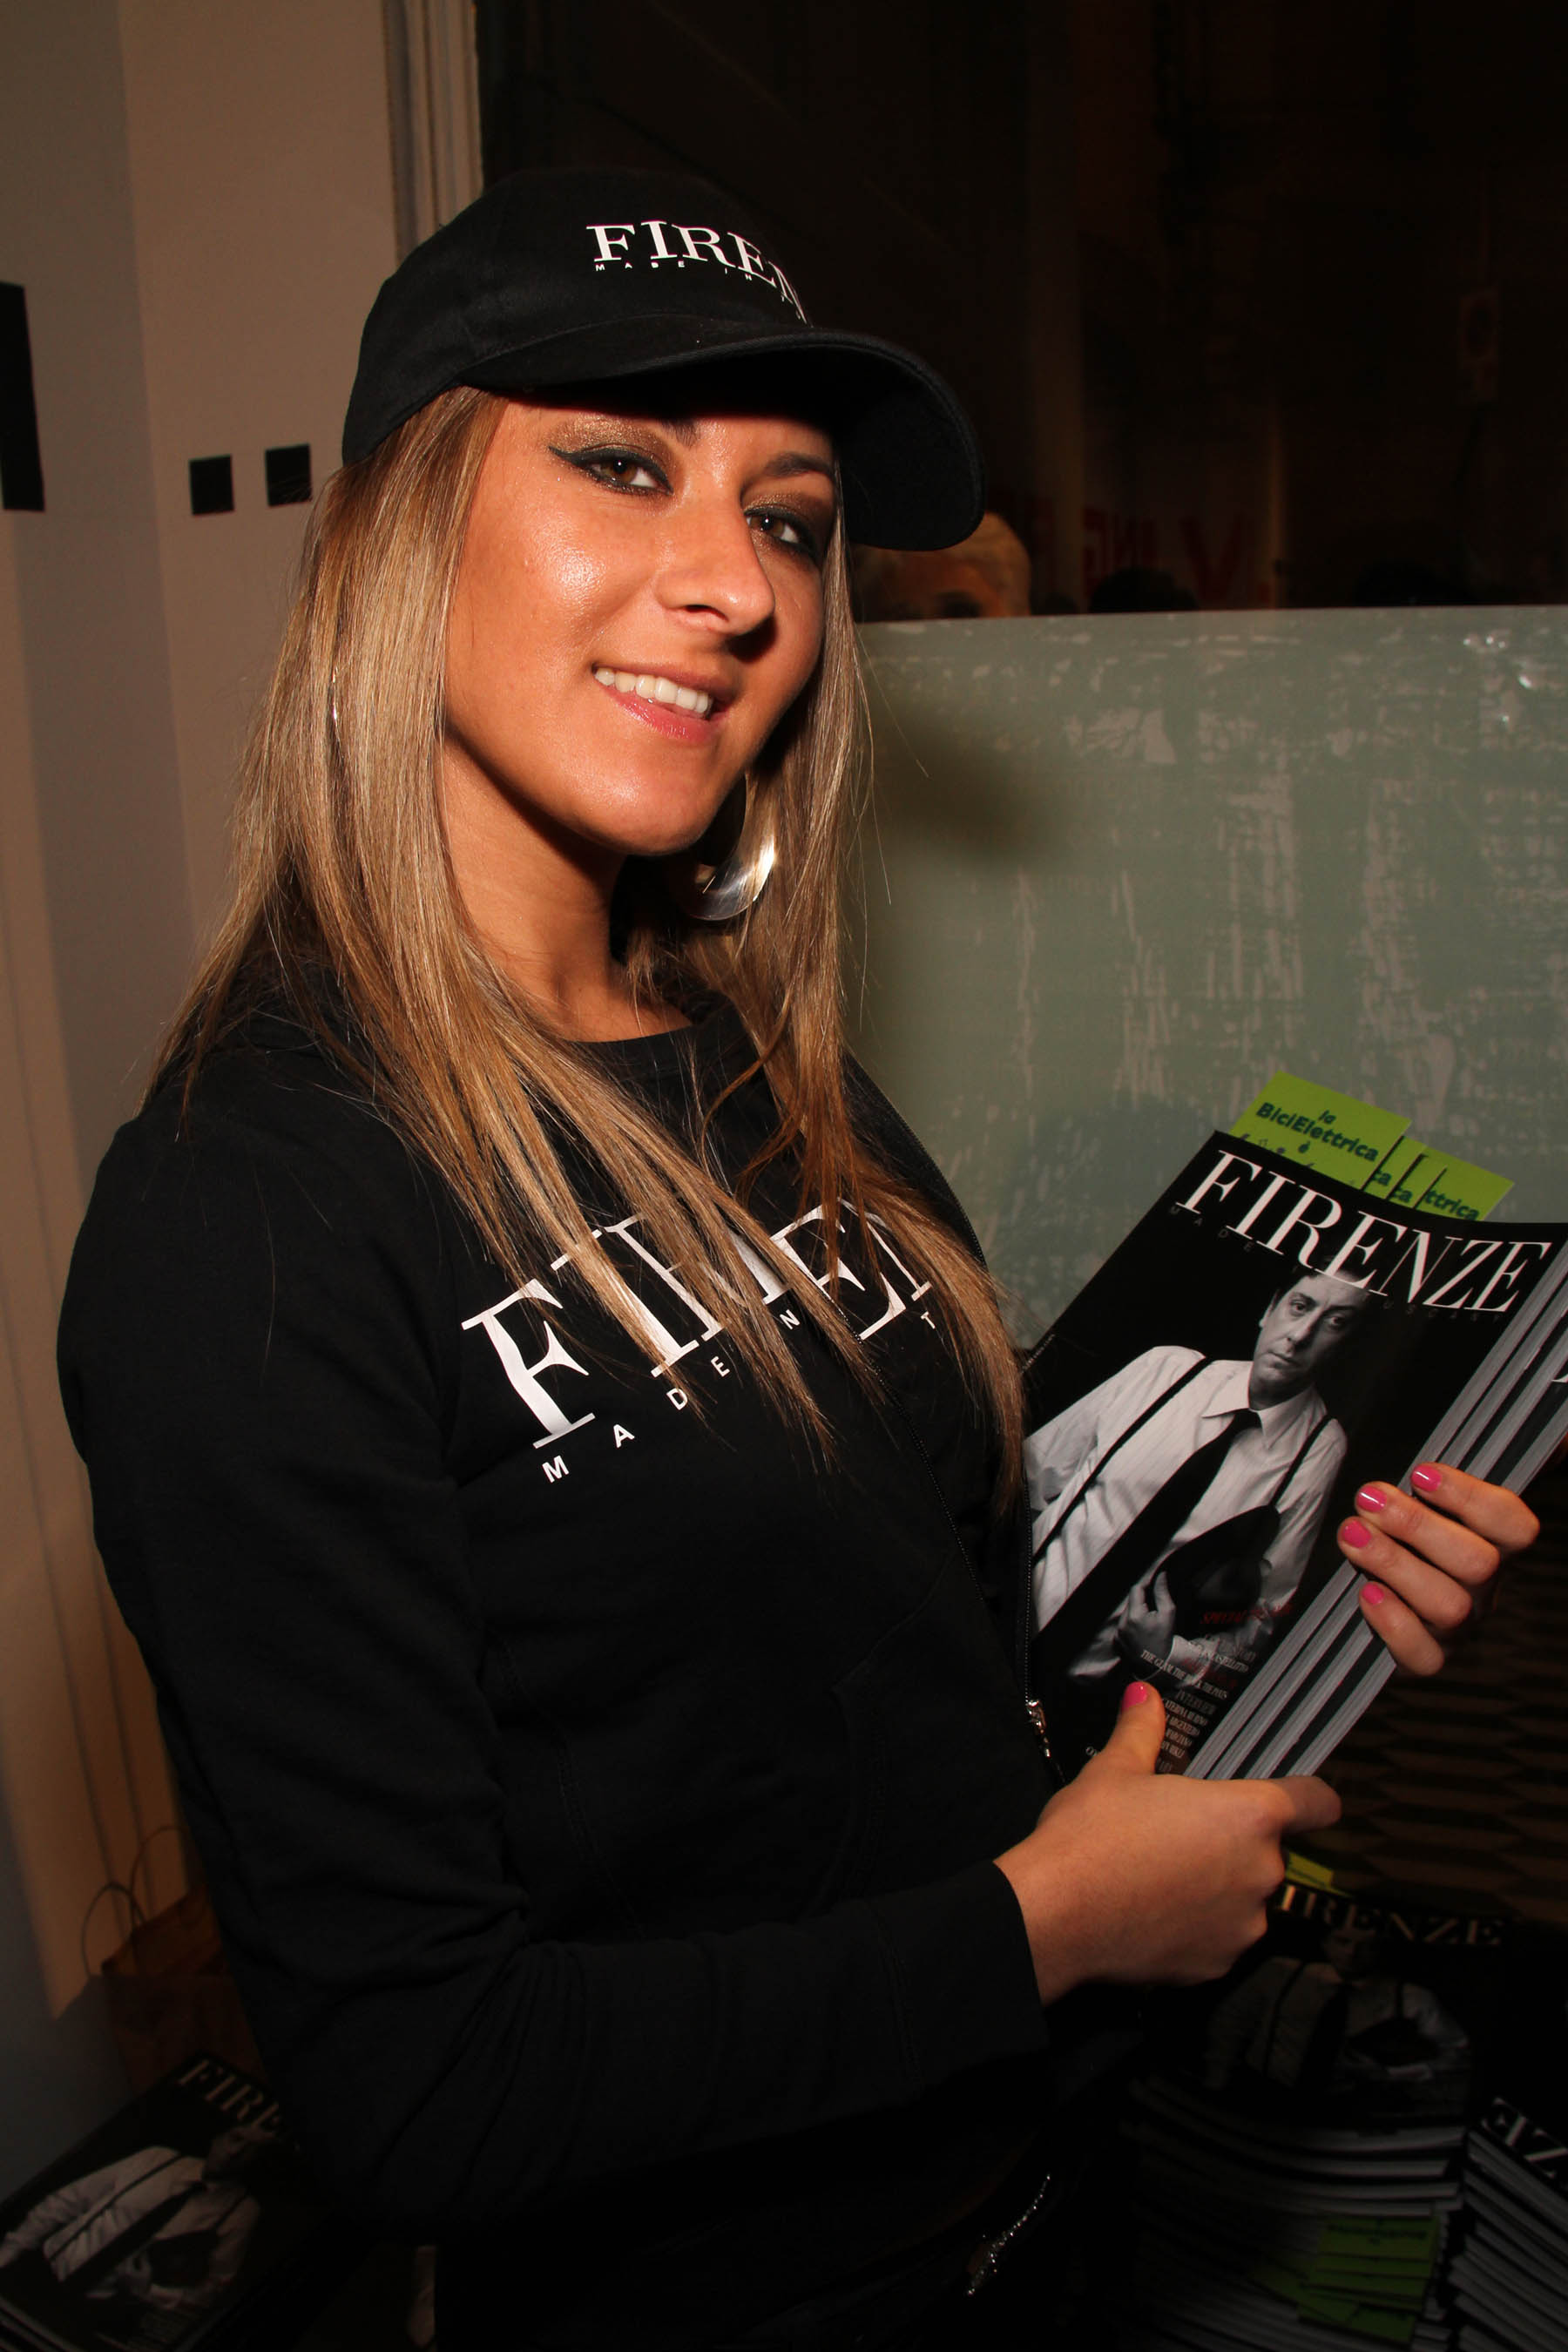 PRESSPHOTO Firenze, festa Firenze Magazine #13, For Gallery. Nella foto